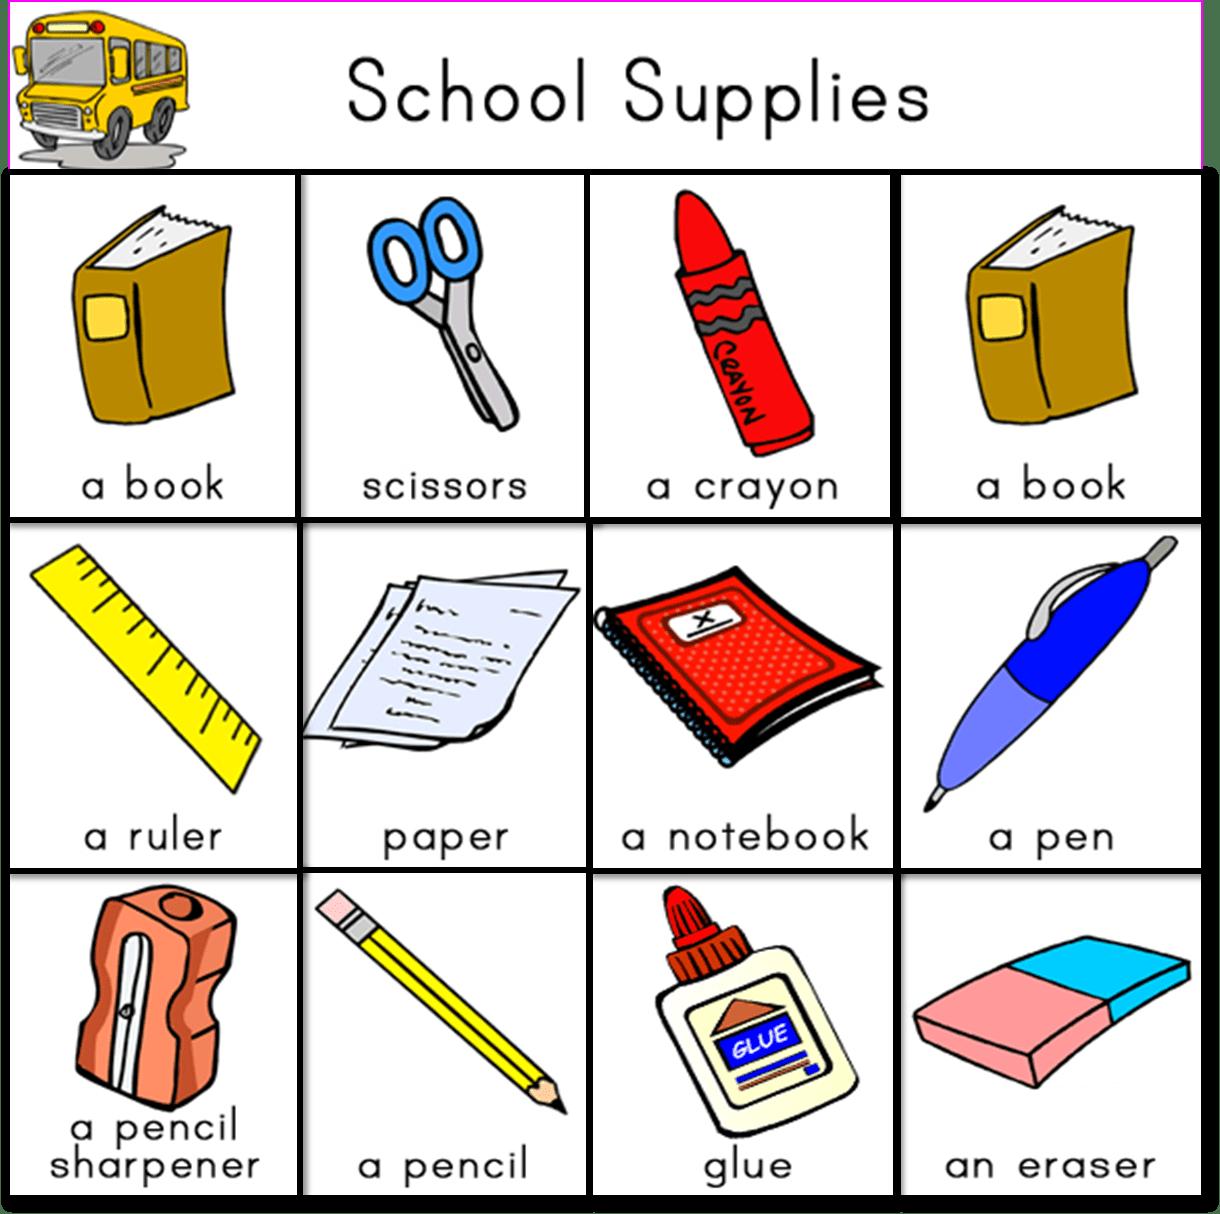 School Supplies Inglesparaminis